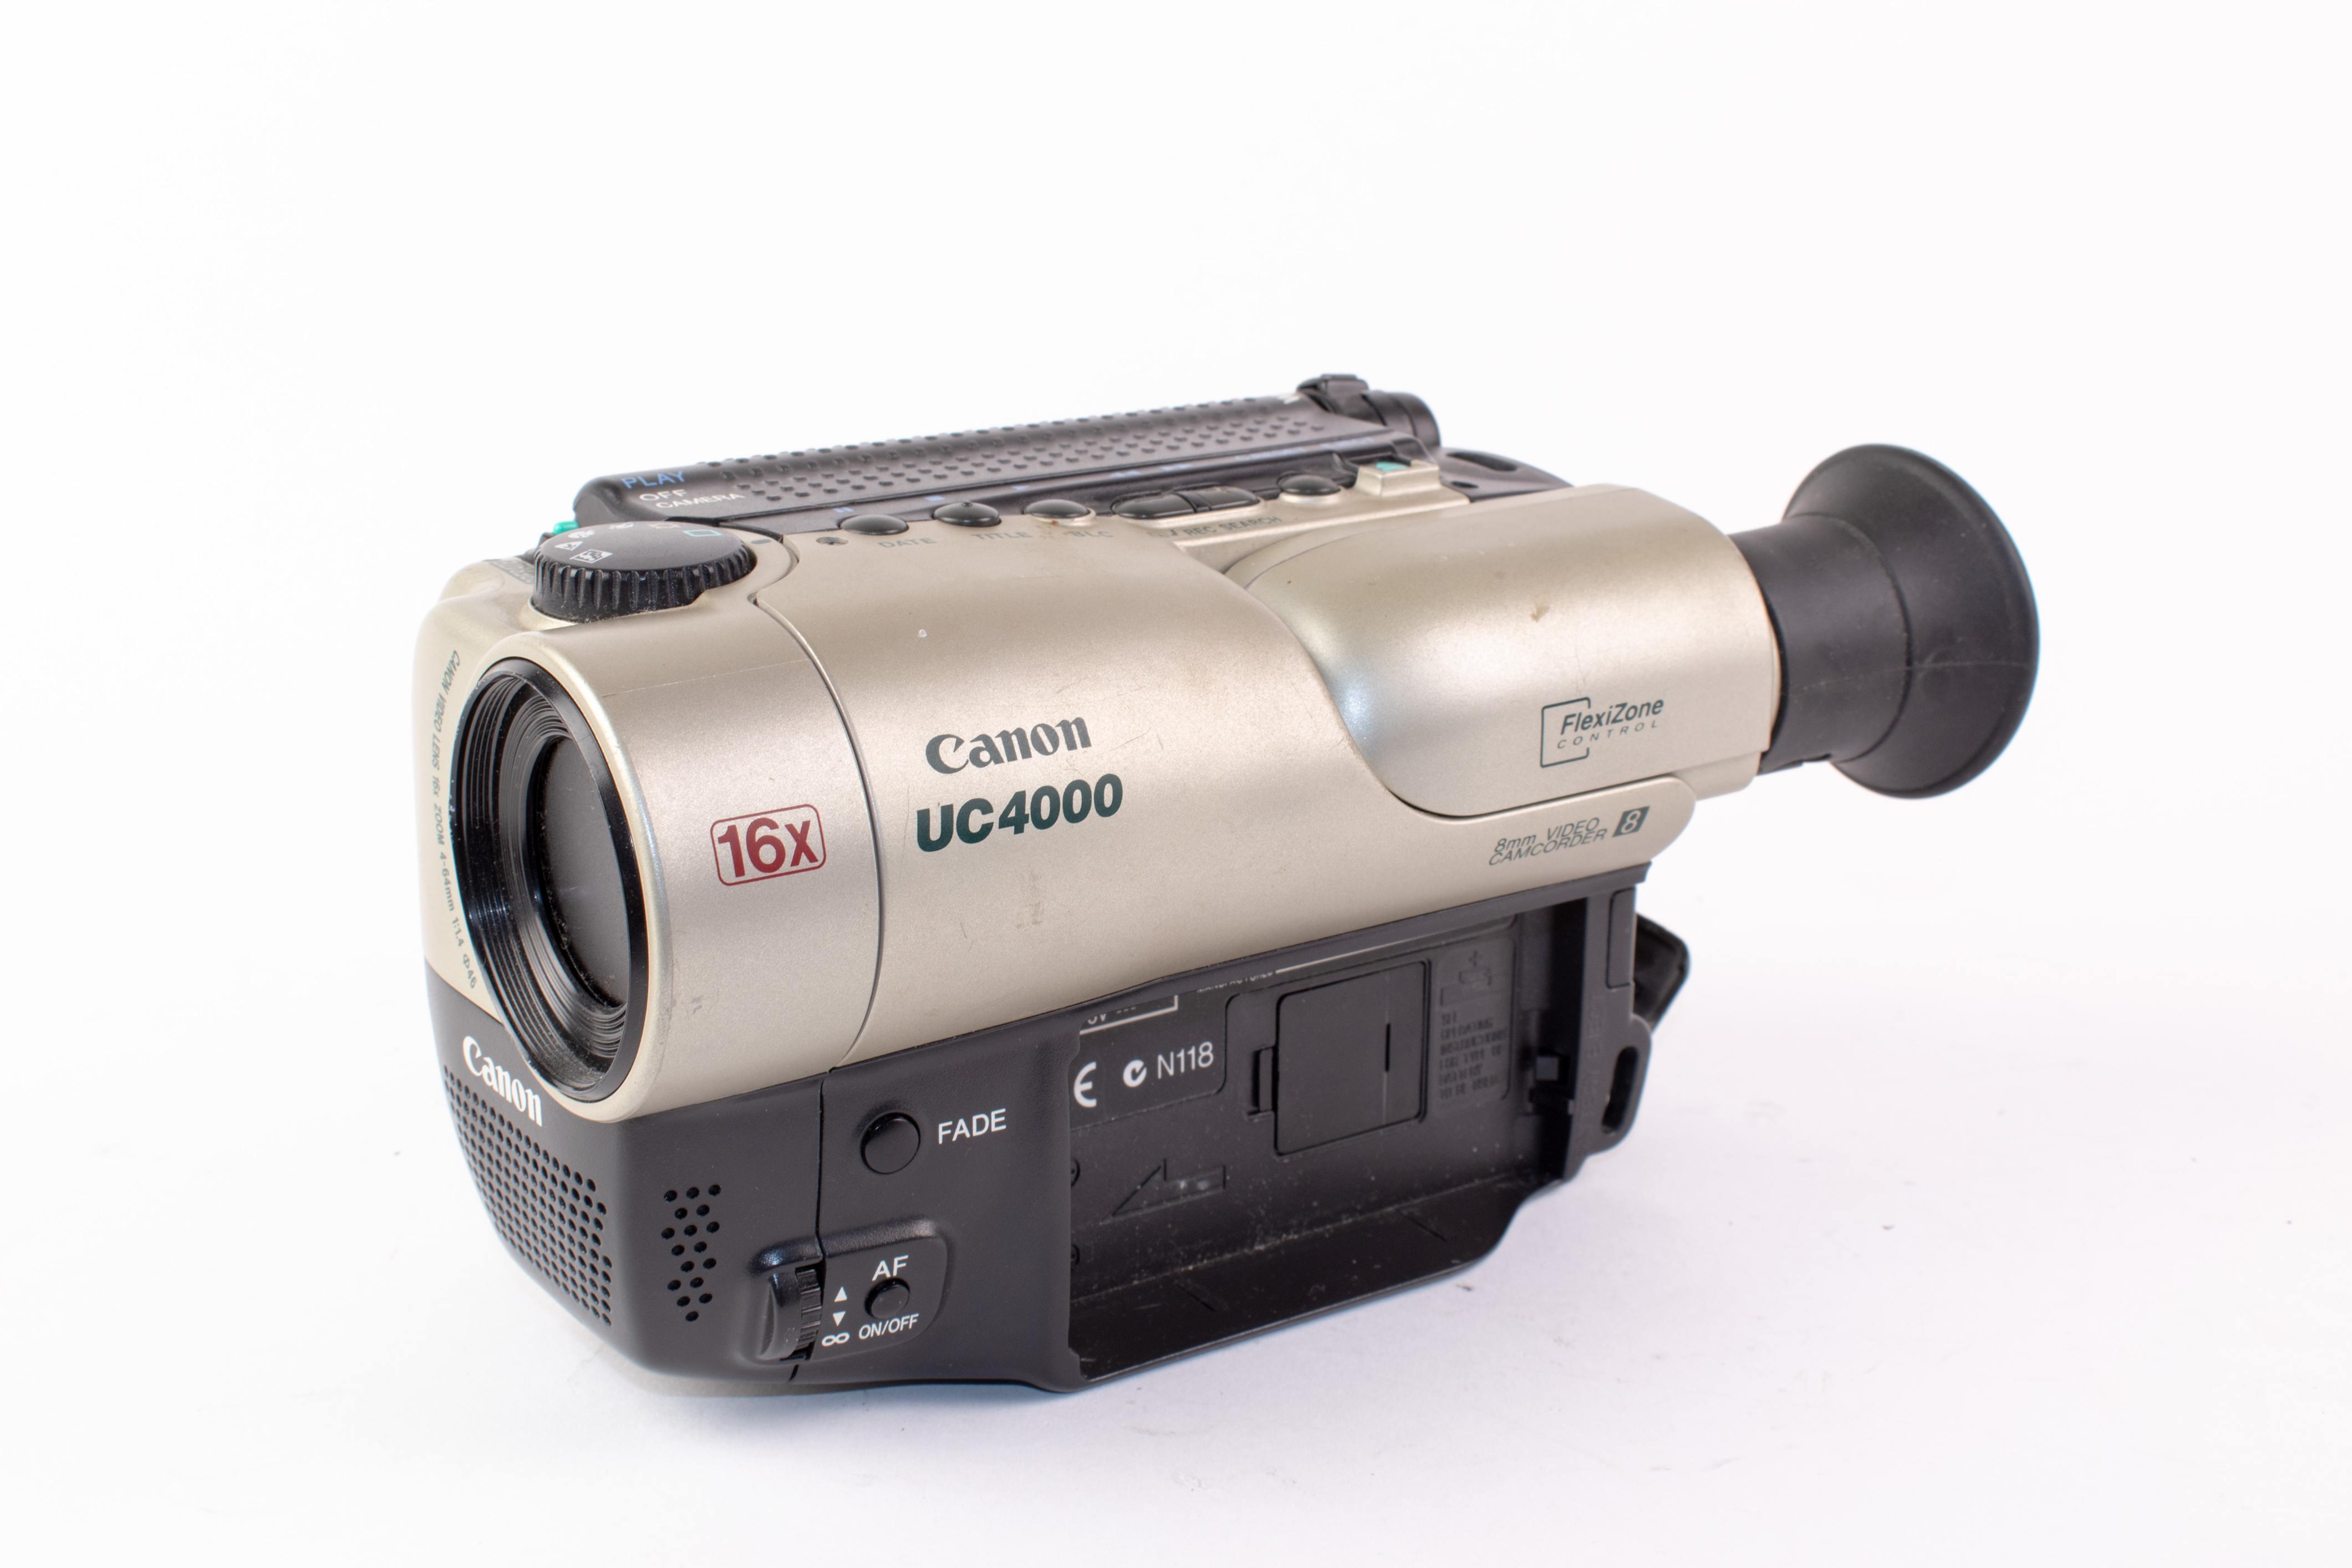 UC4000